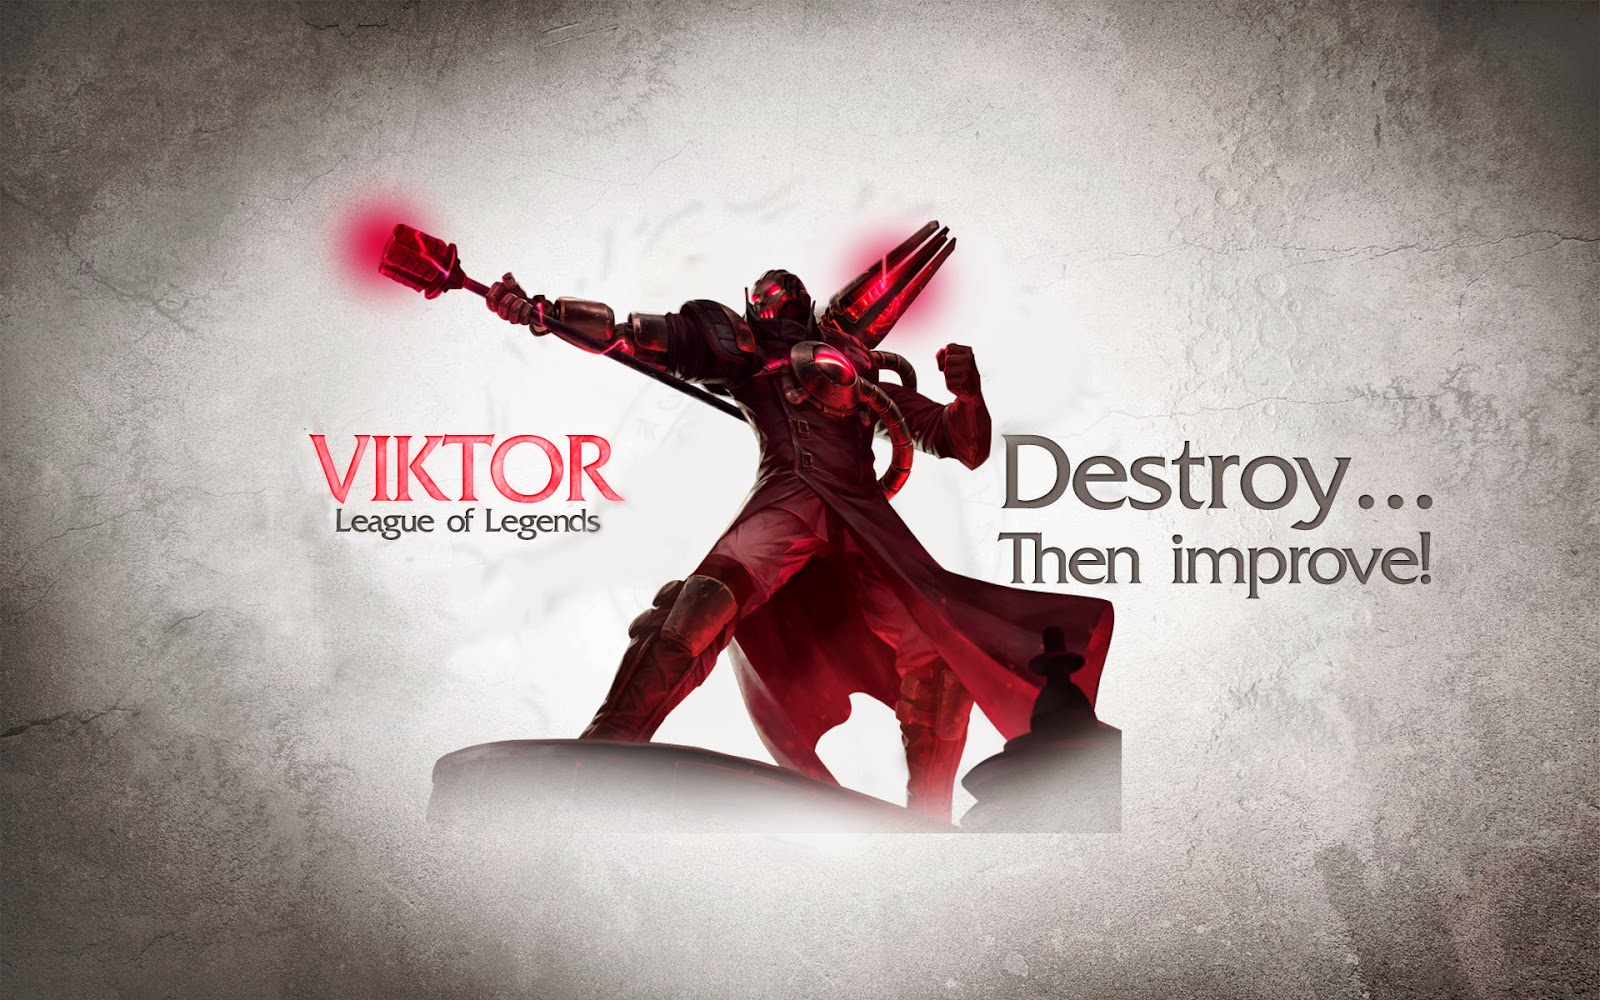 viktor league of legends wallpaper viktor desktop wallpaper